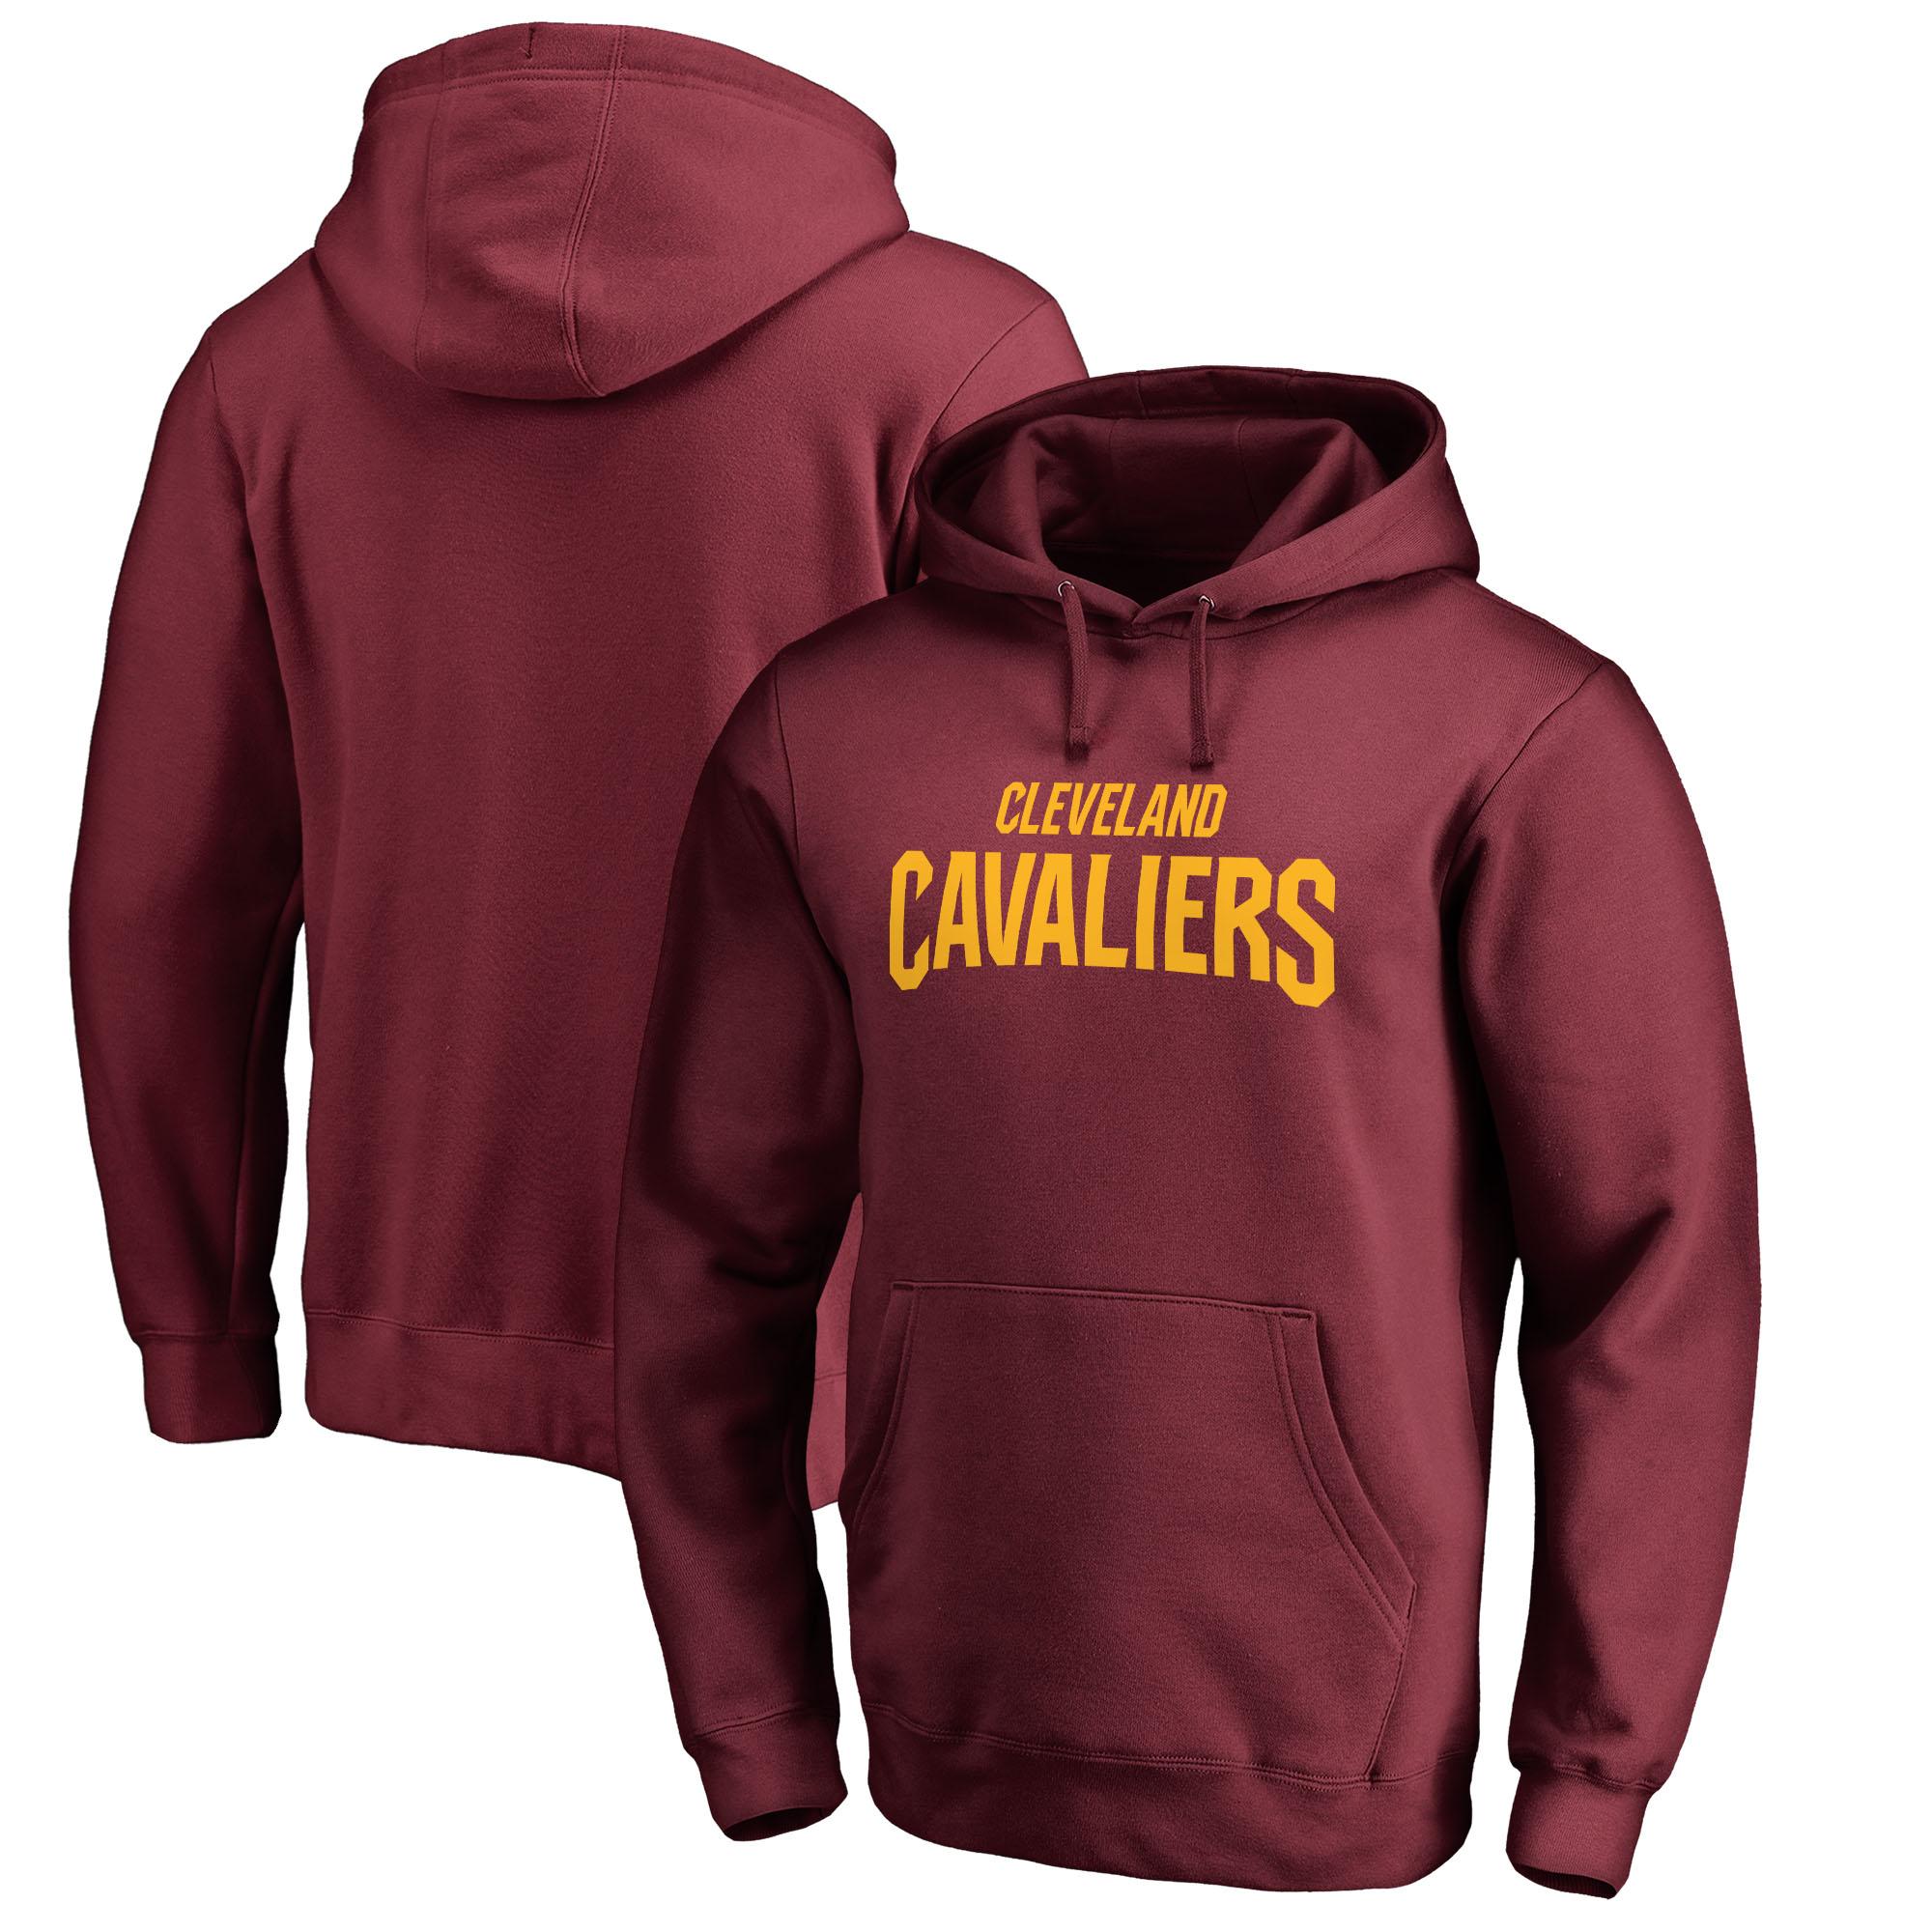 Cleveland Cavaliers Fanatics Branded Wordmark Pullover Hoodie - Wine